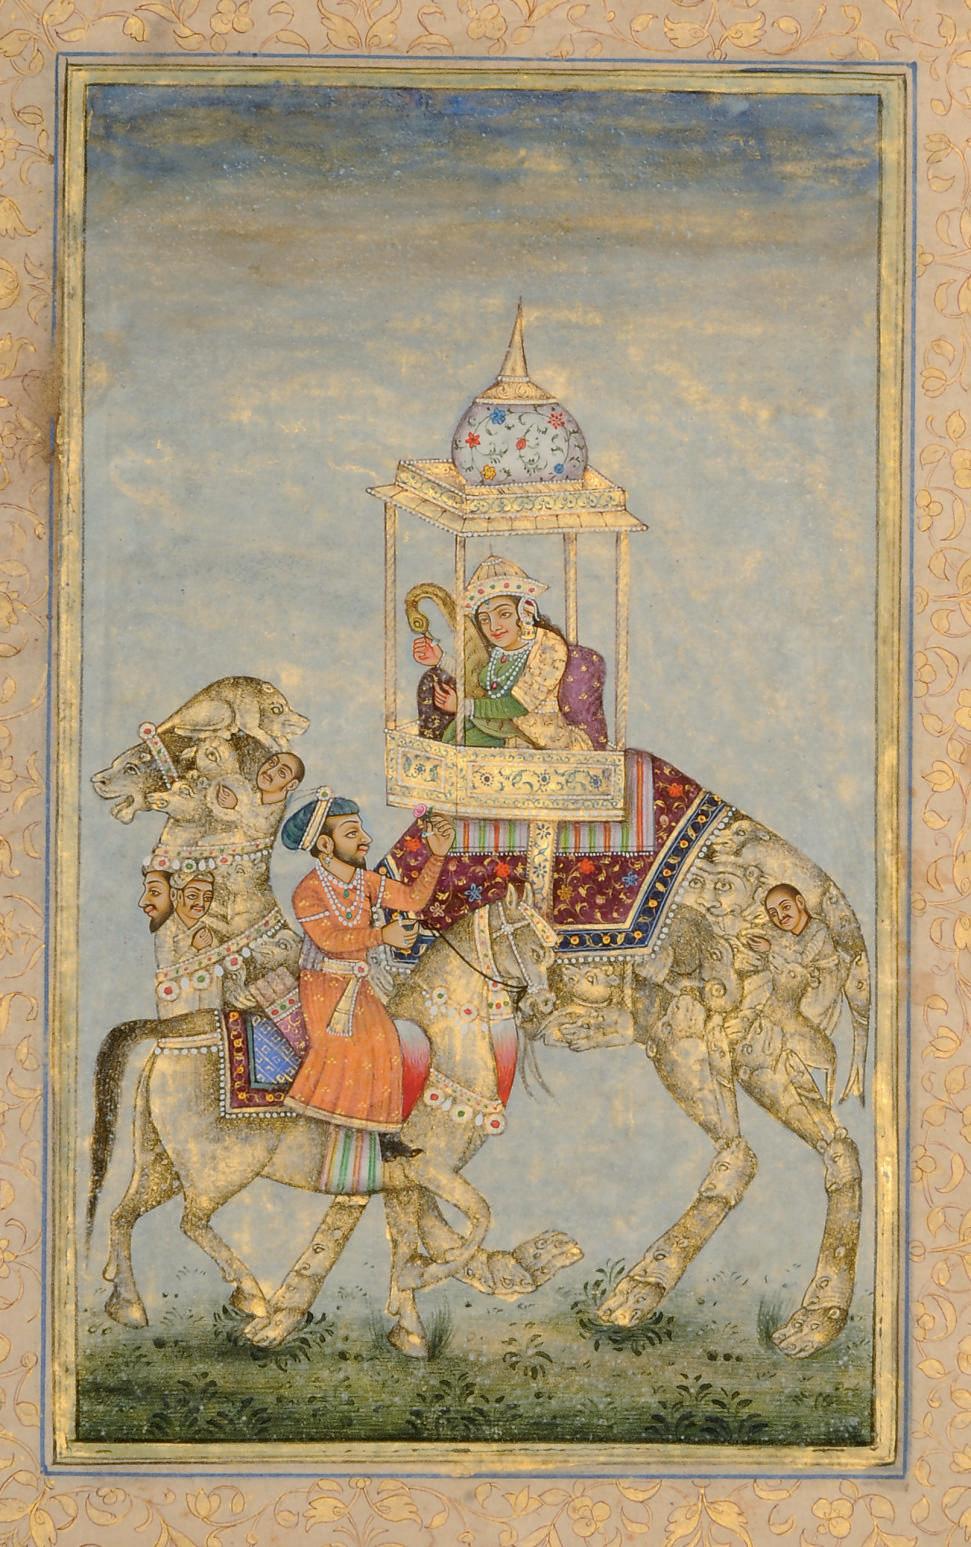 AN INDIAN PRINCE ON HORSEBACK